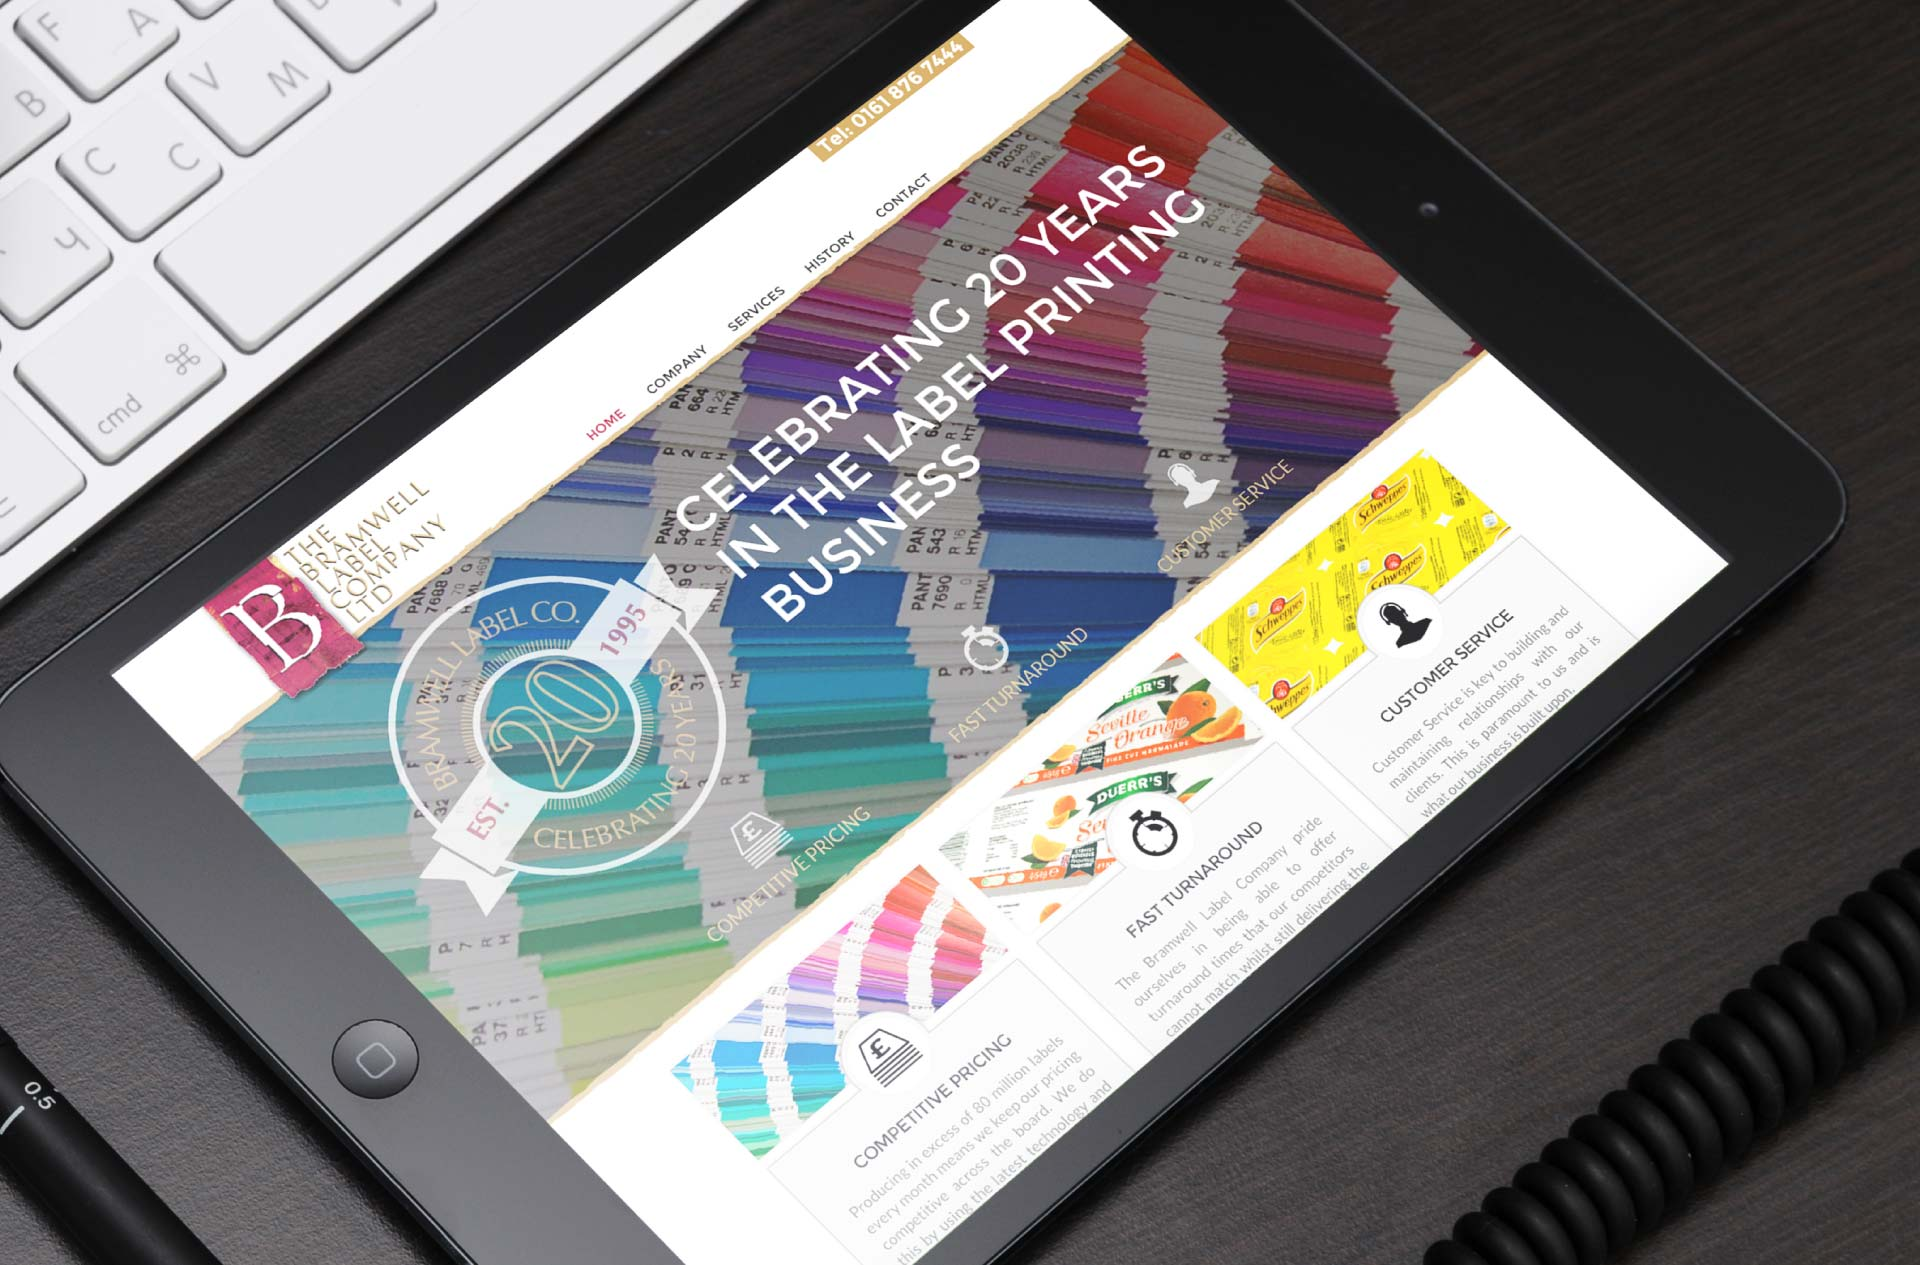 Website design for Bramwell Labels, Manchester